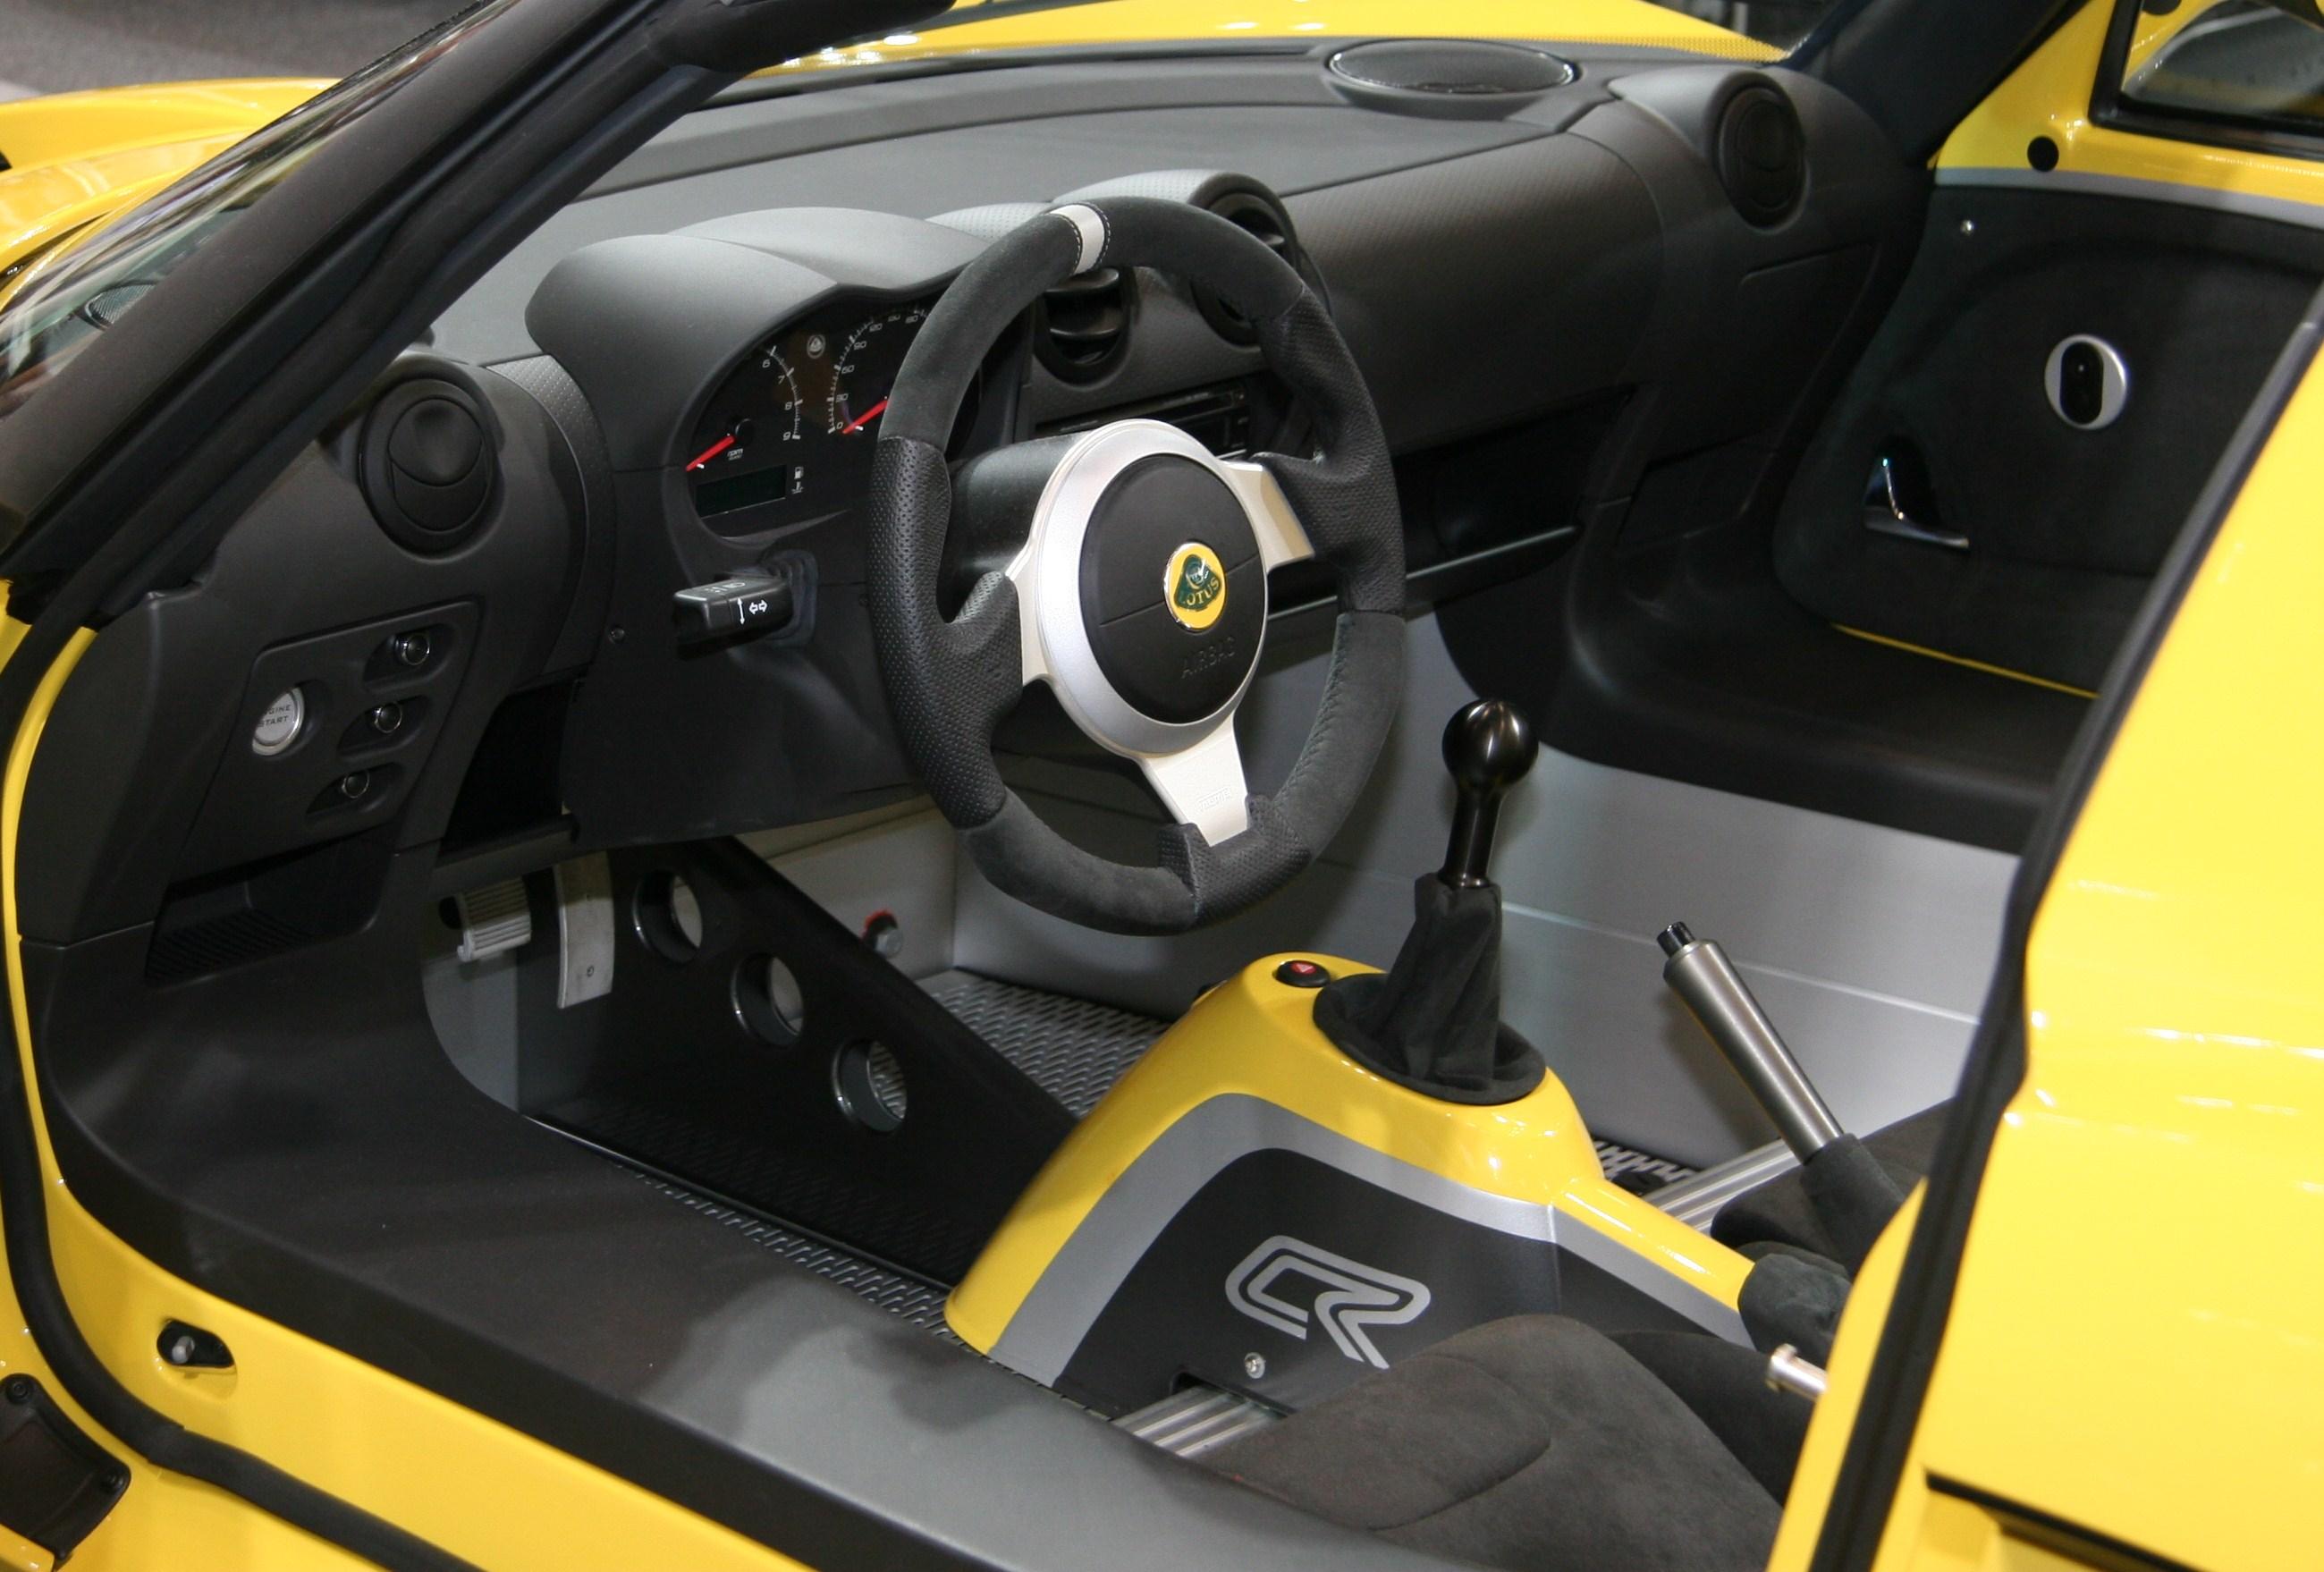 File:Lotus Elise Club Racer interior.jpg - Wikimedia Commons